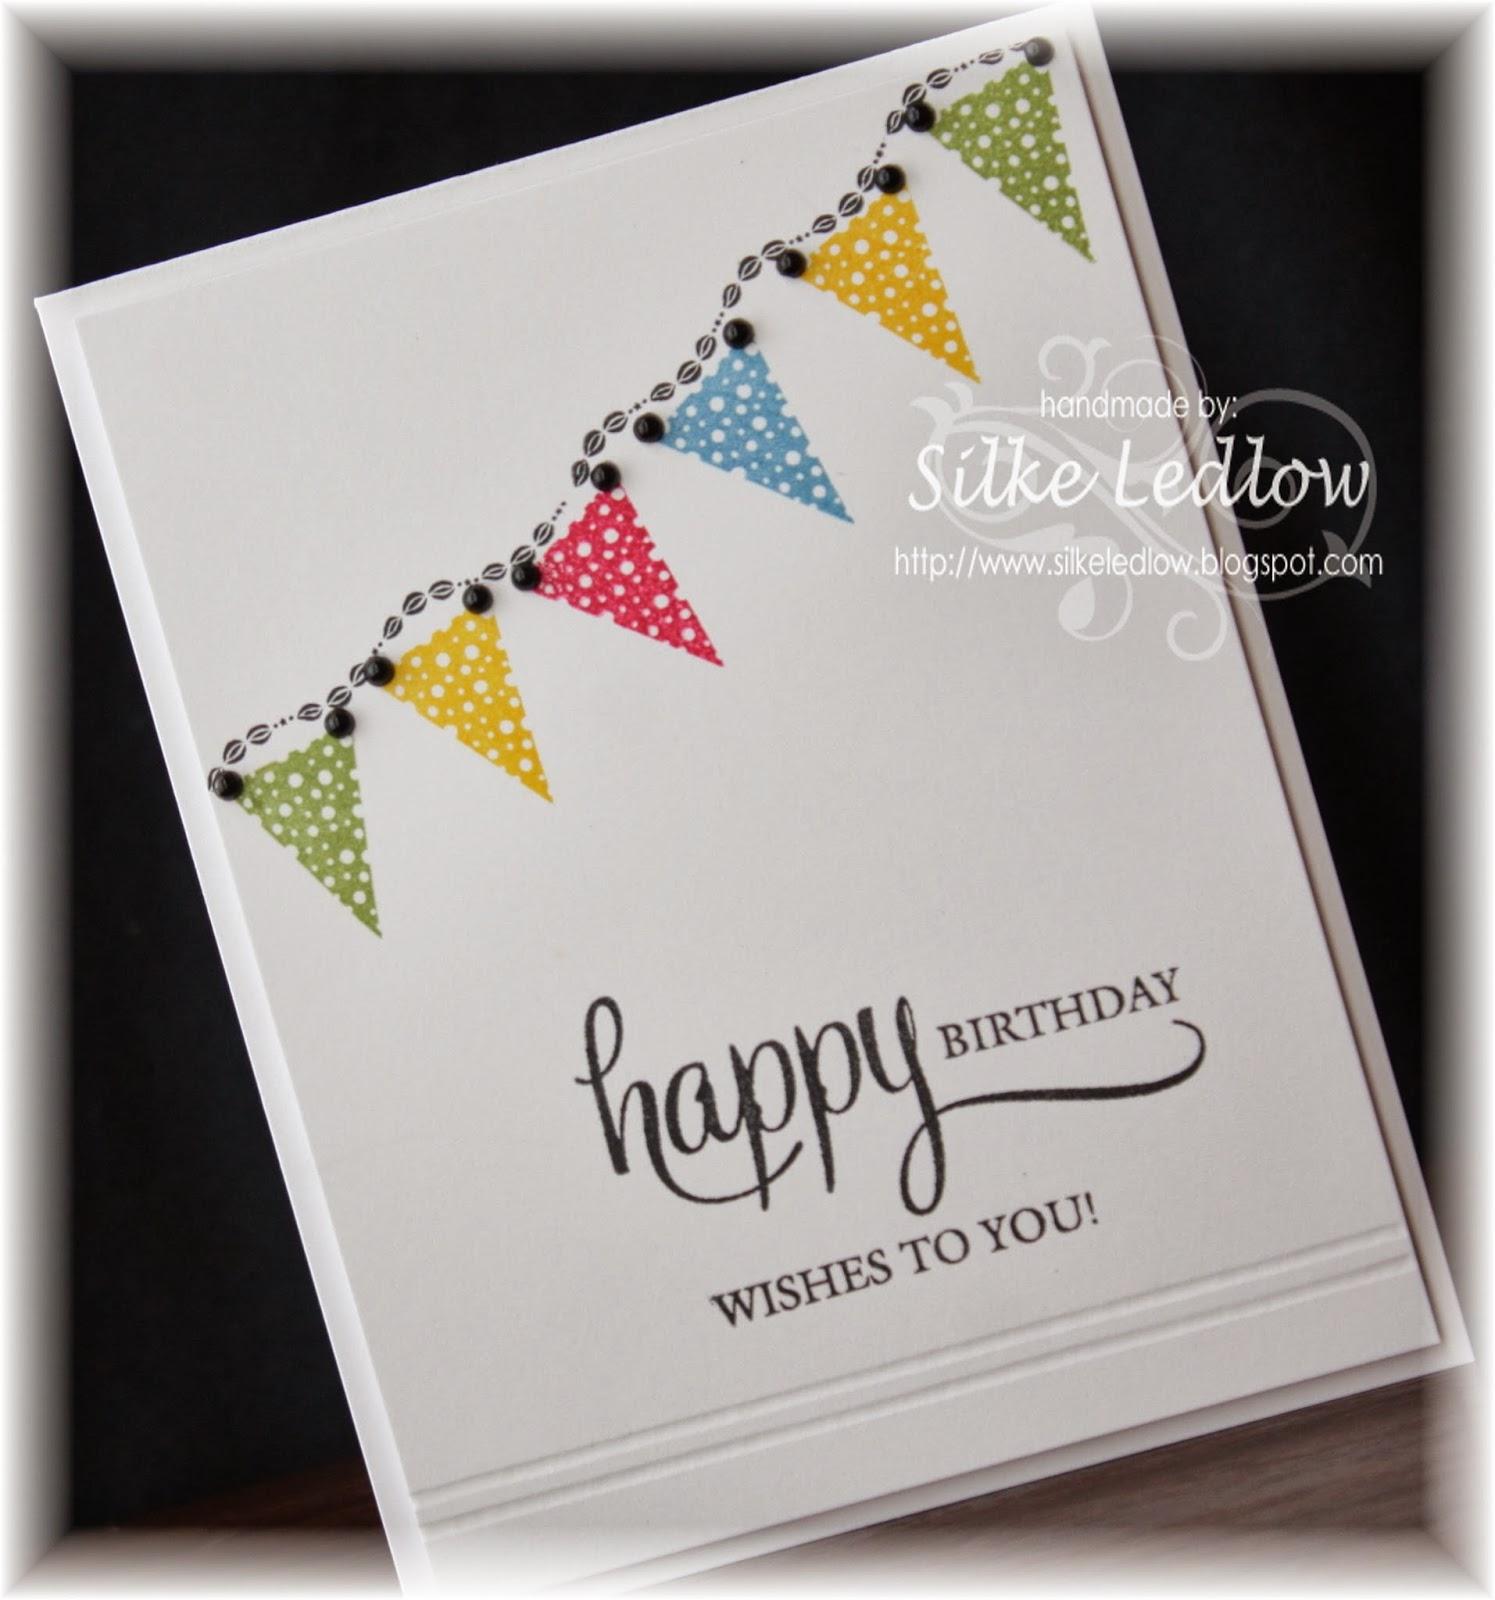 October Birthday Ecards ~ My life by silke ledlow cs happy birthday wishes to you